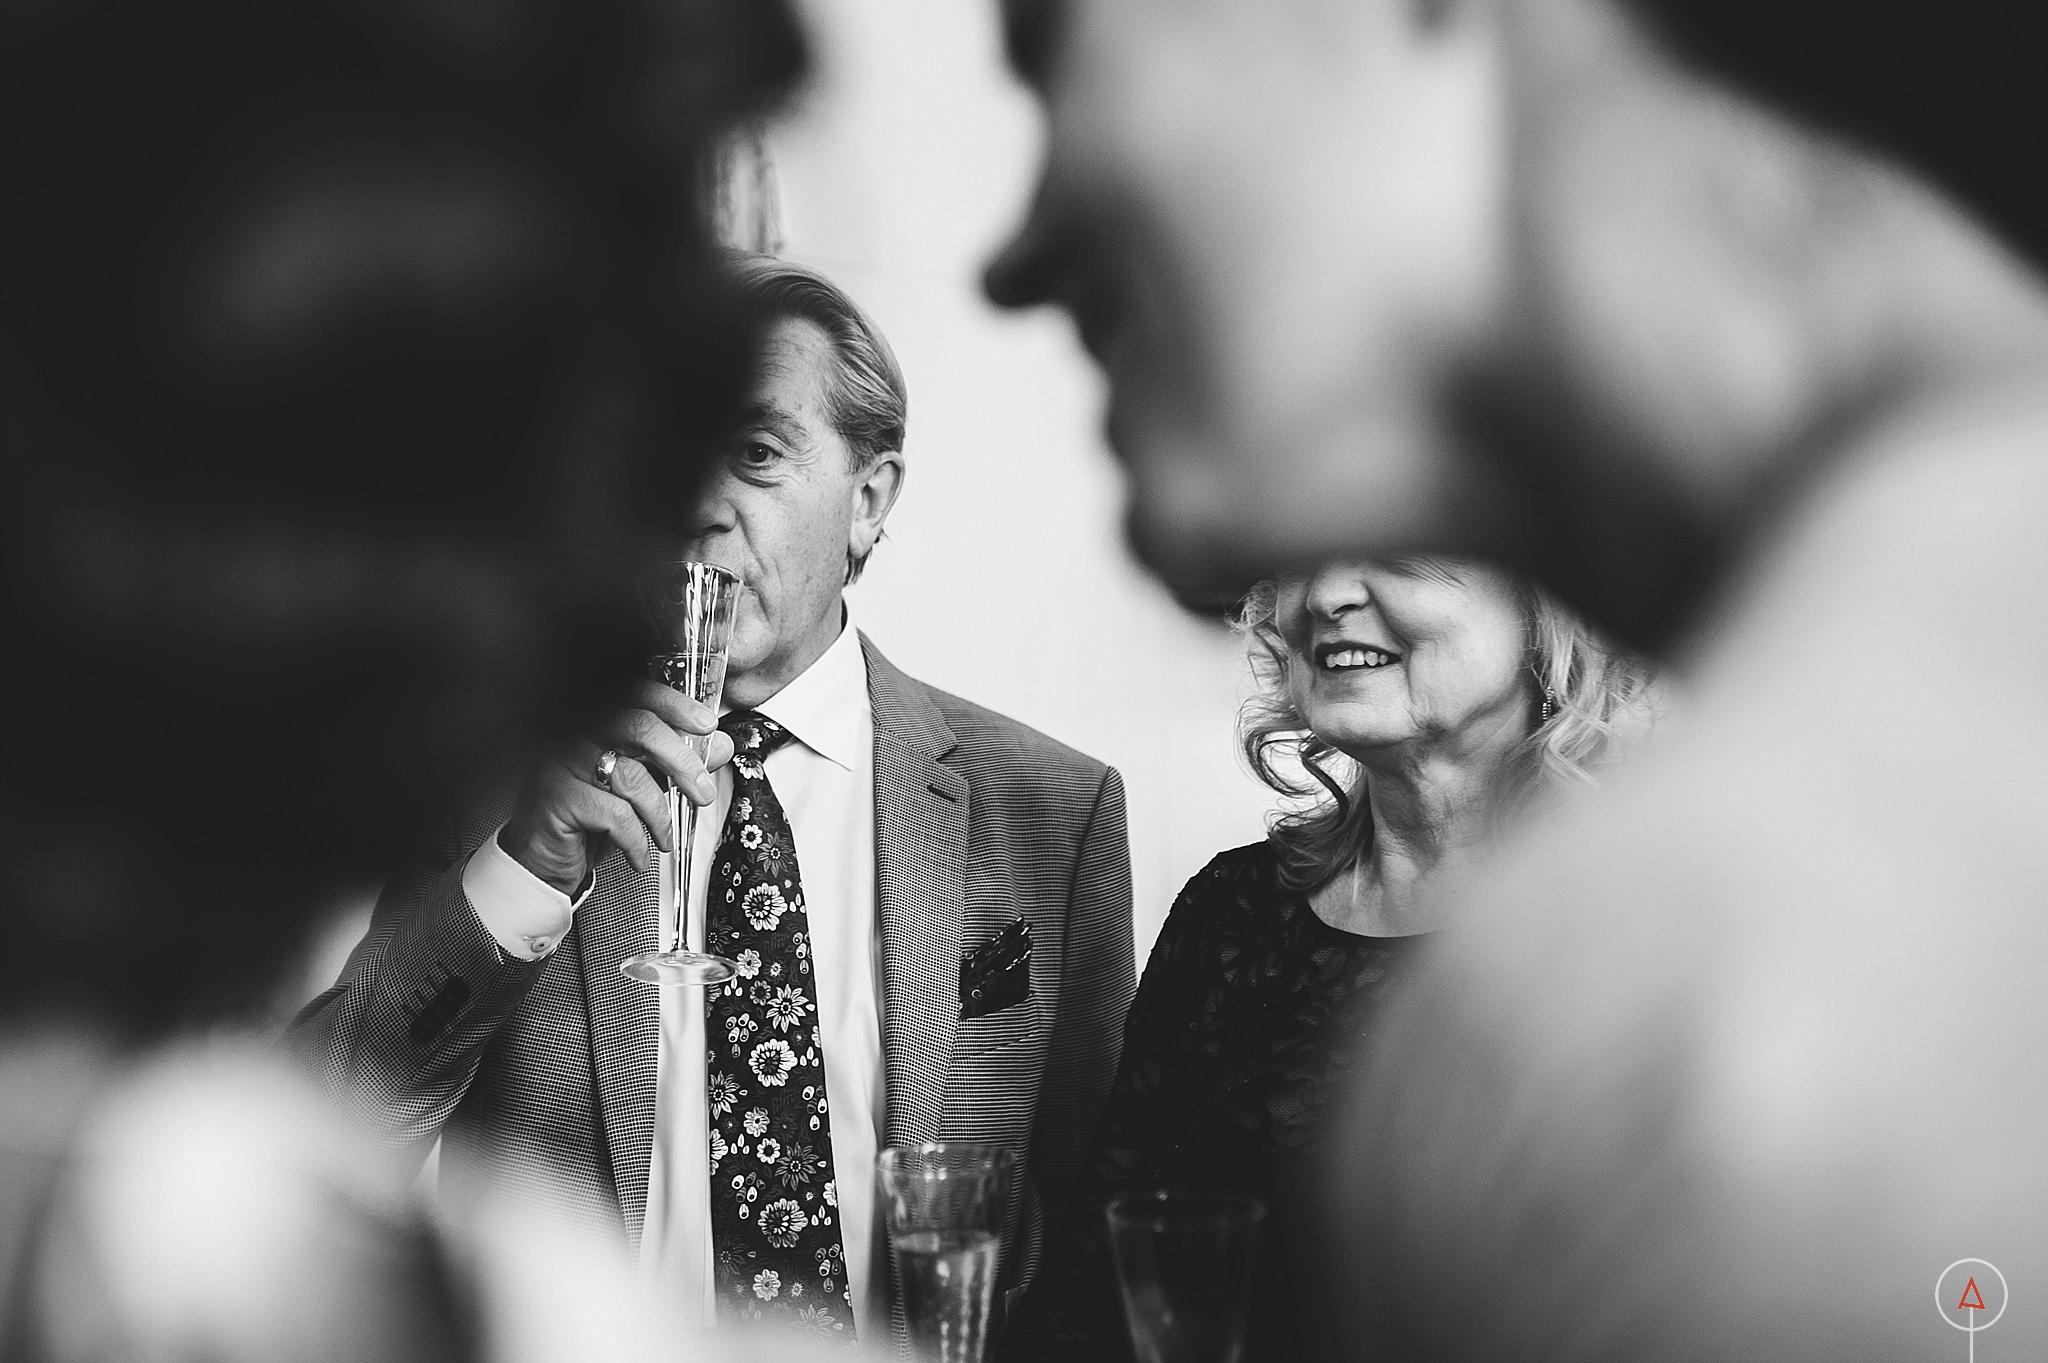 cardiff-wedding-photographer-aga-tomaszek_0271